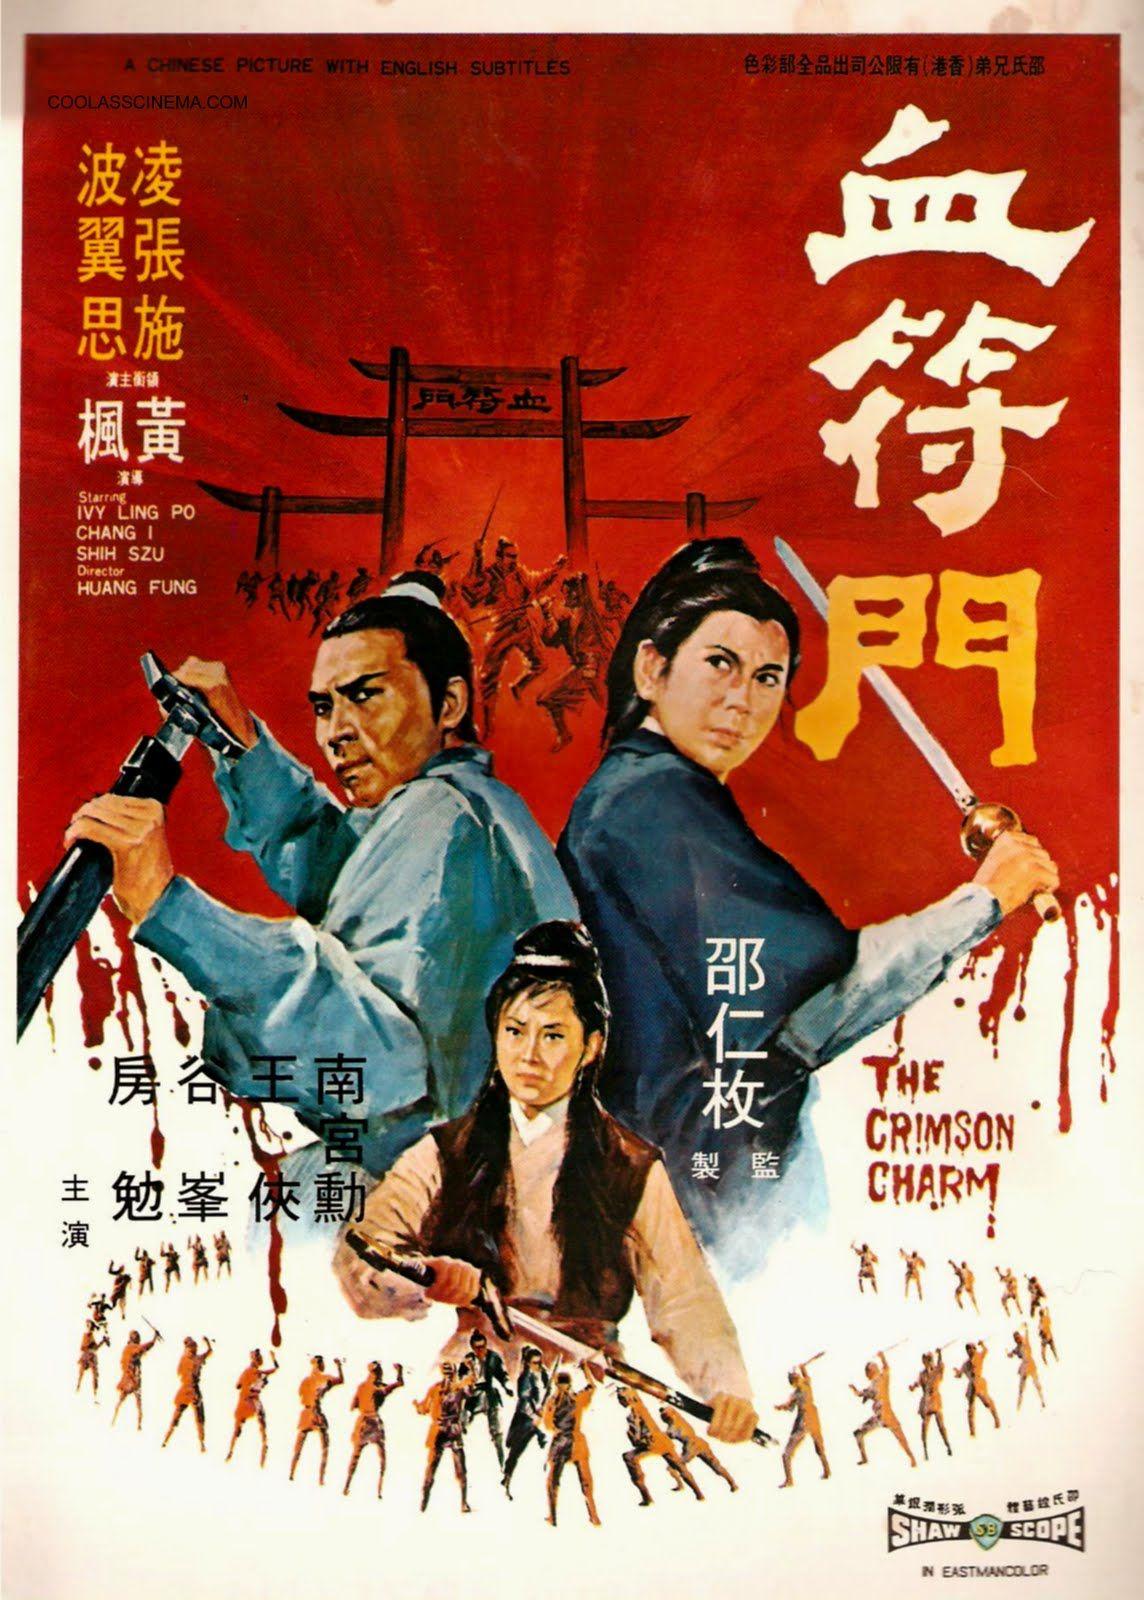 The Crimson Charm (1971) (Huang Feng)